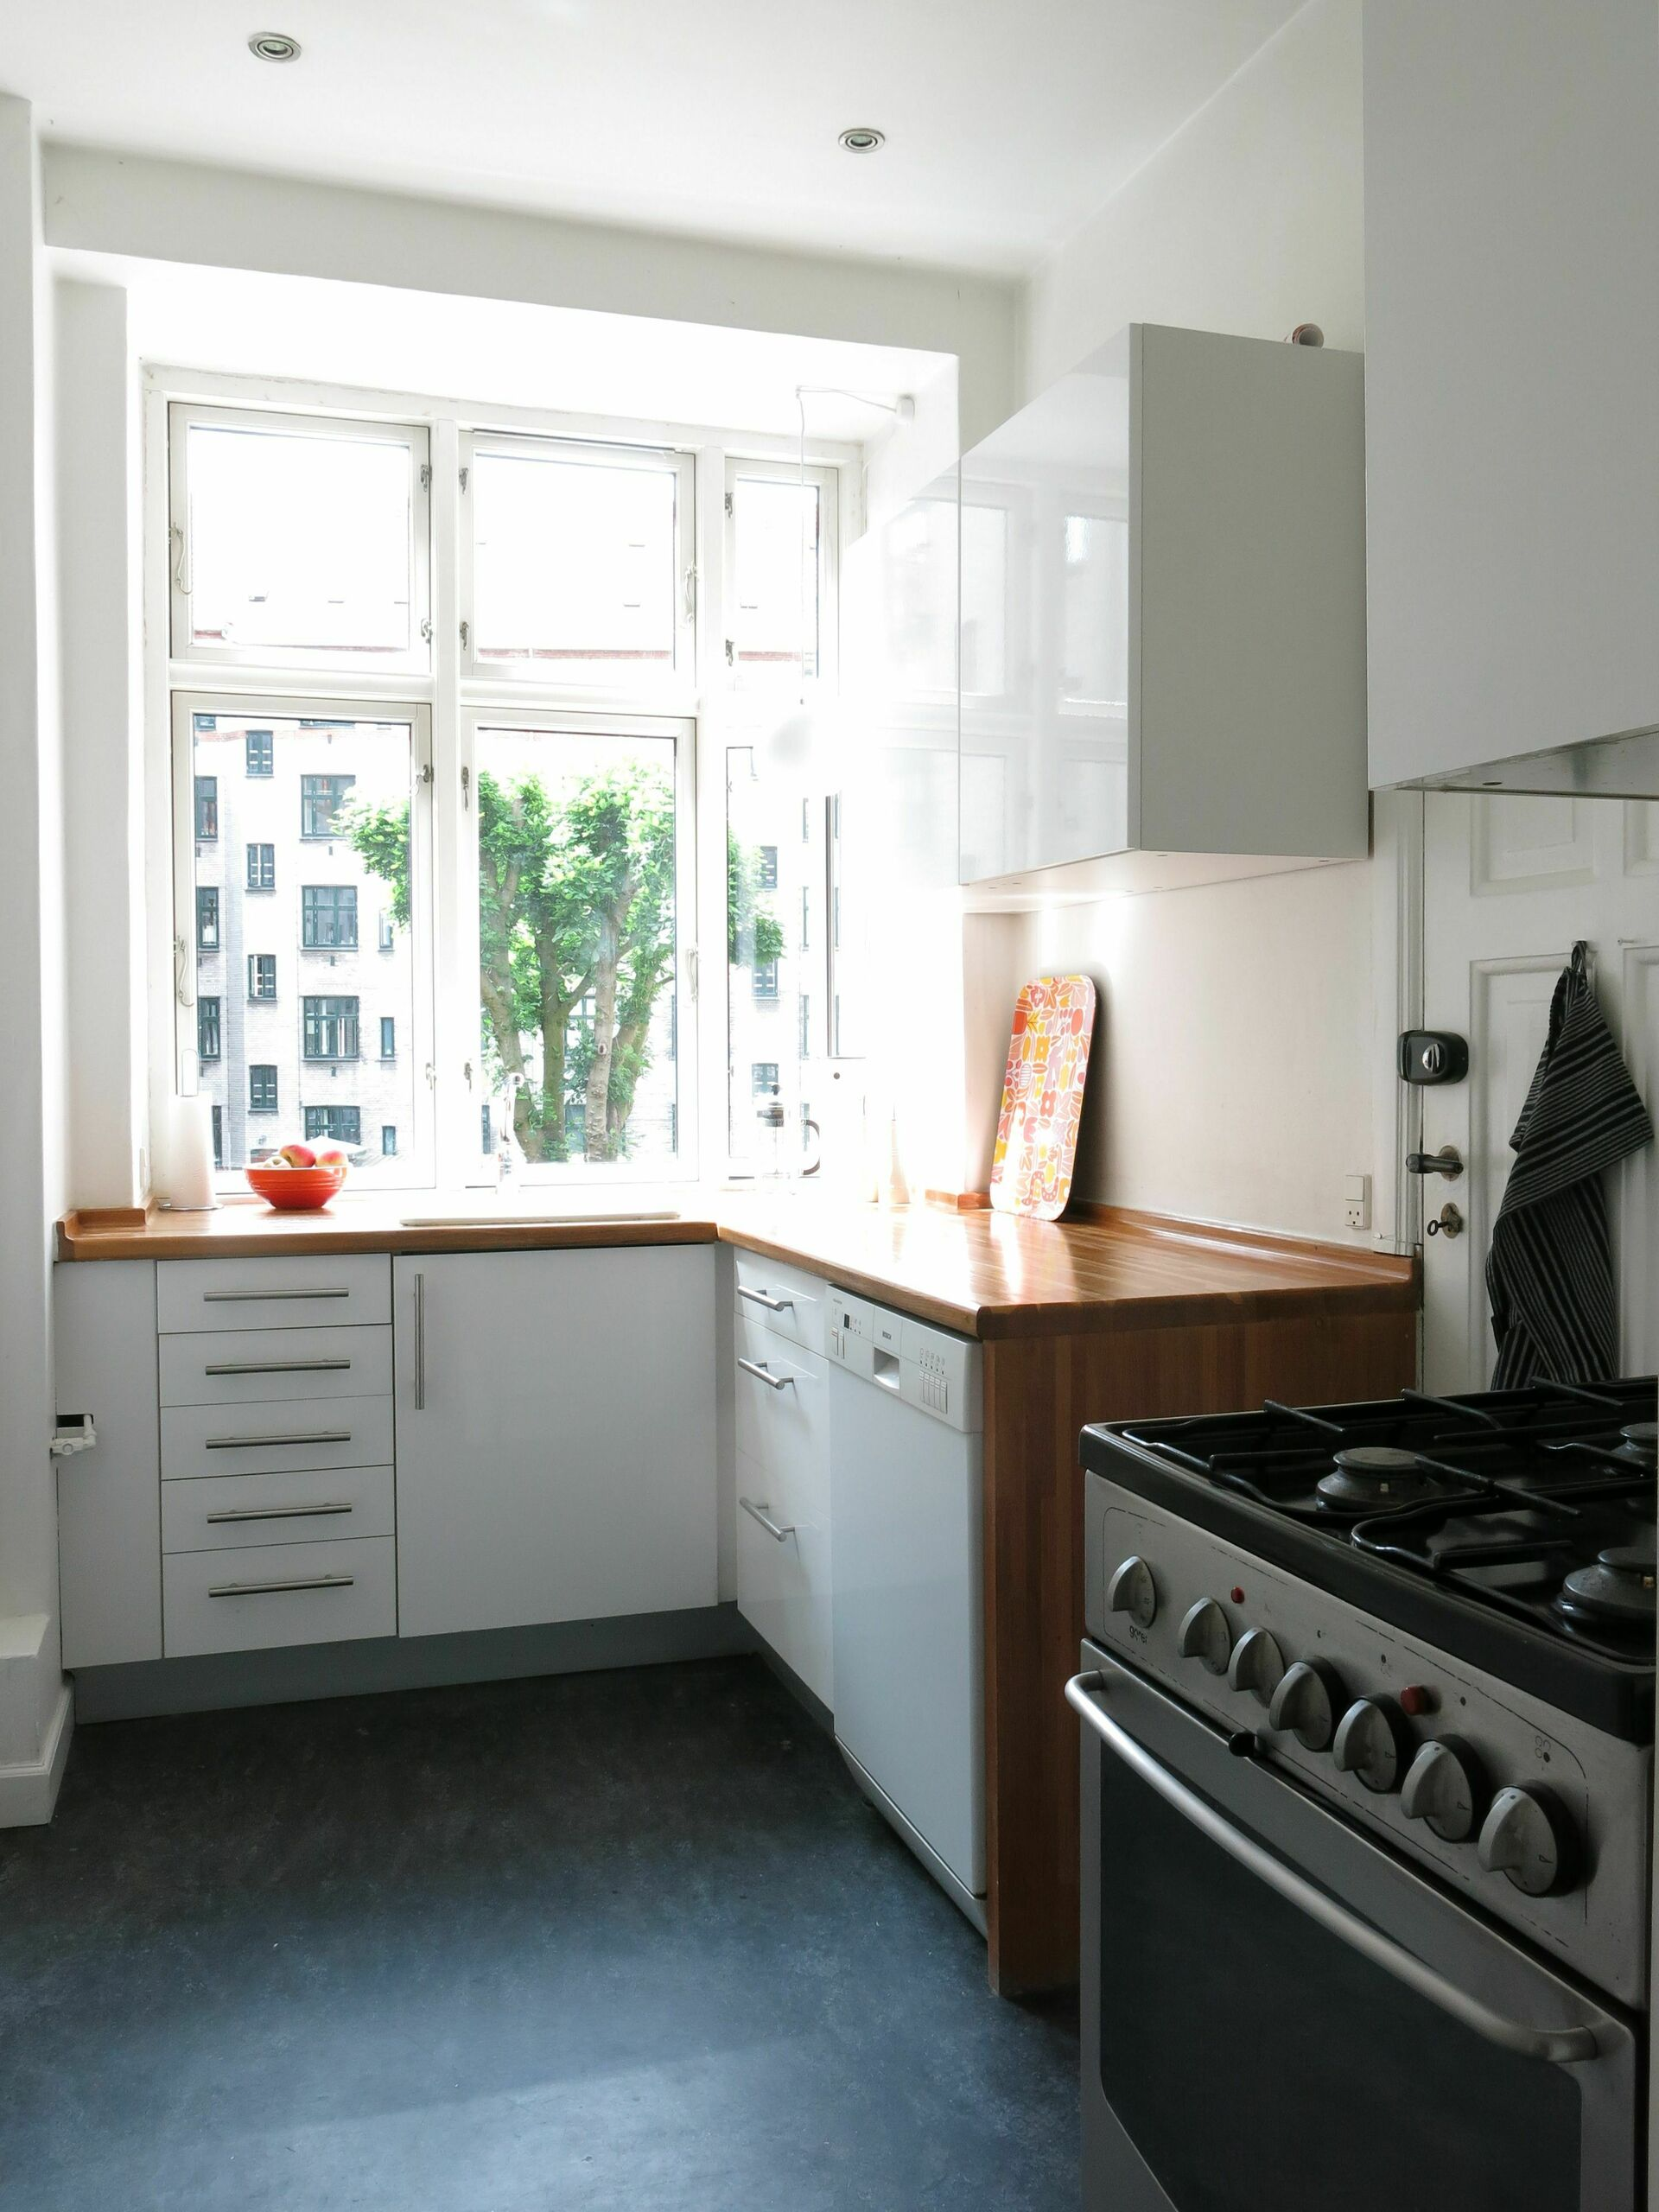 Kopenhagen Wohnung vordingborggade 1 wohnung in kopenhagen